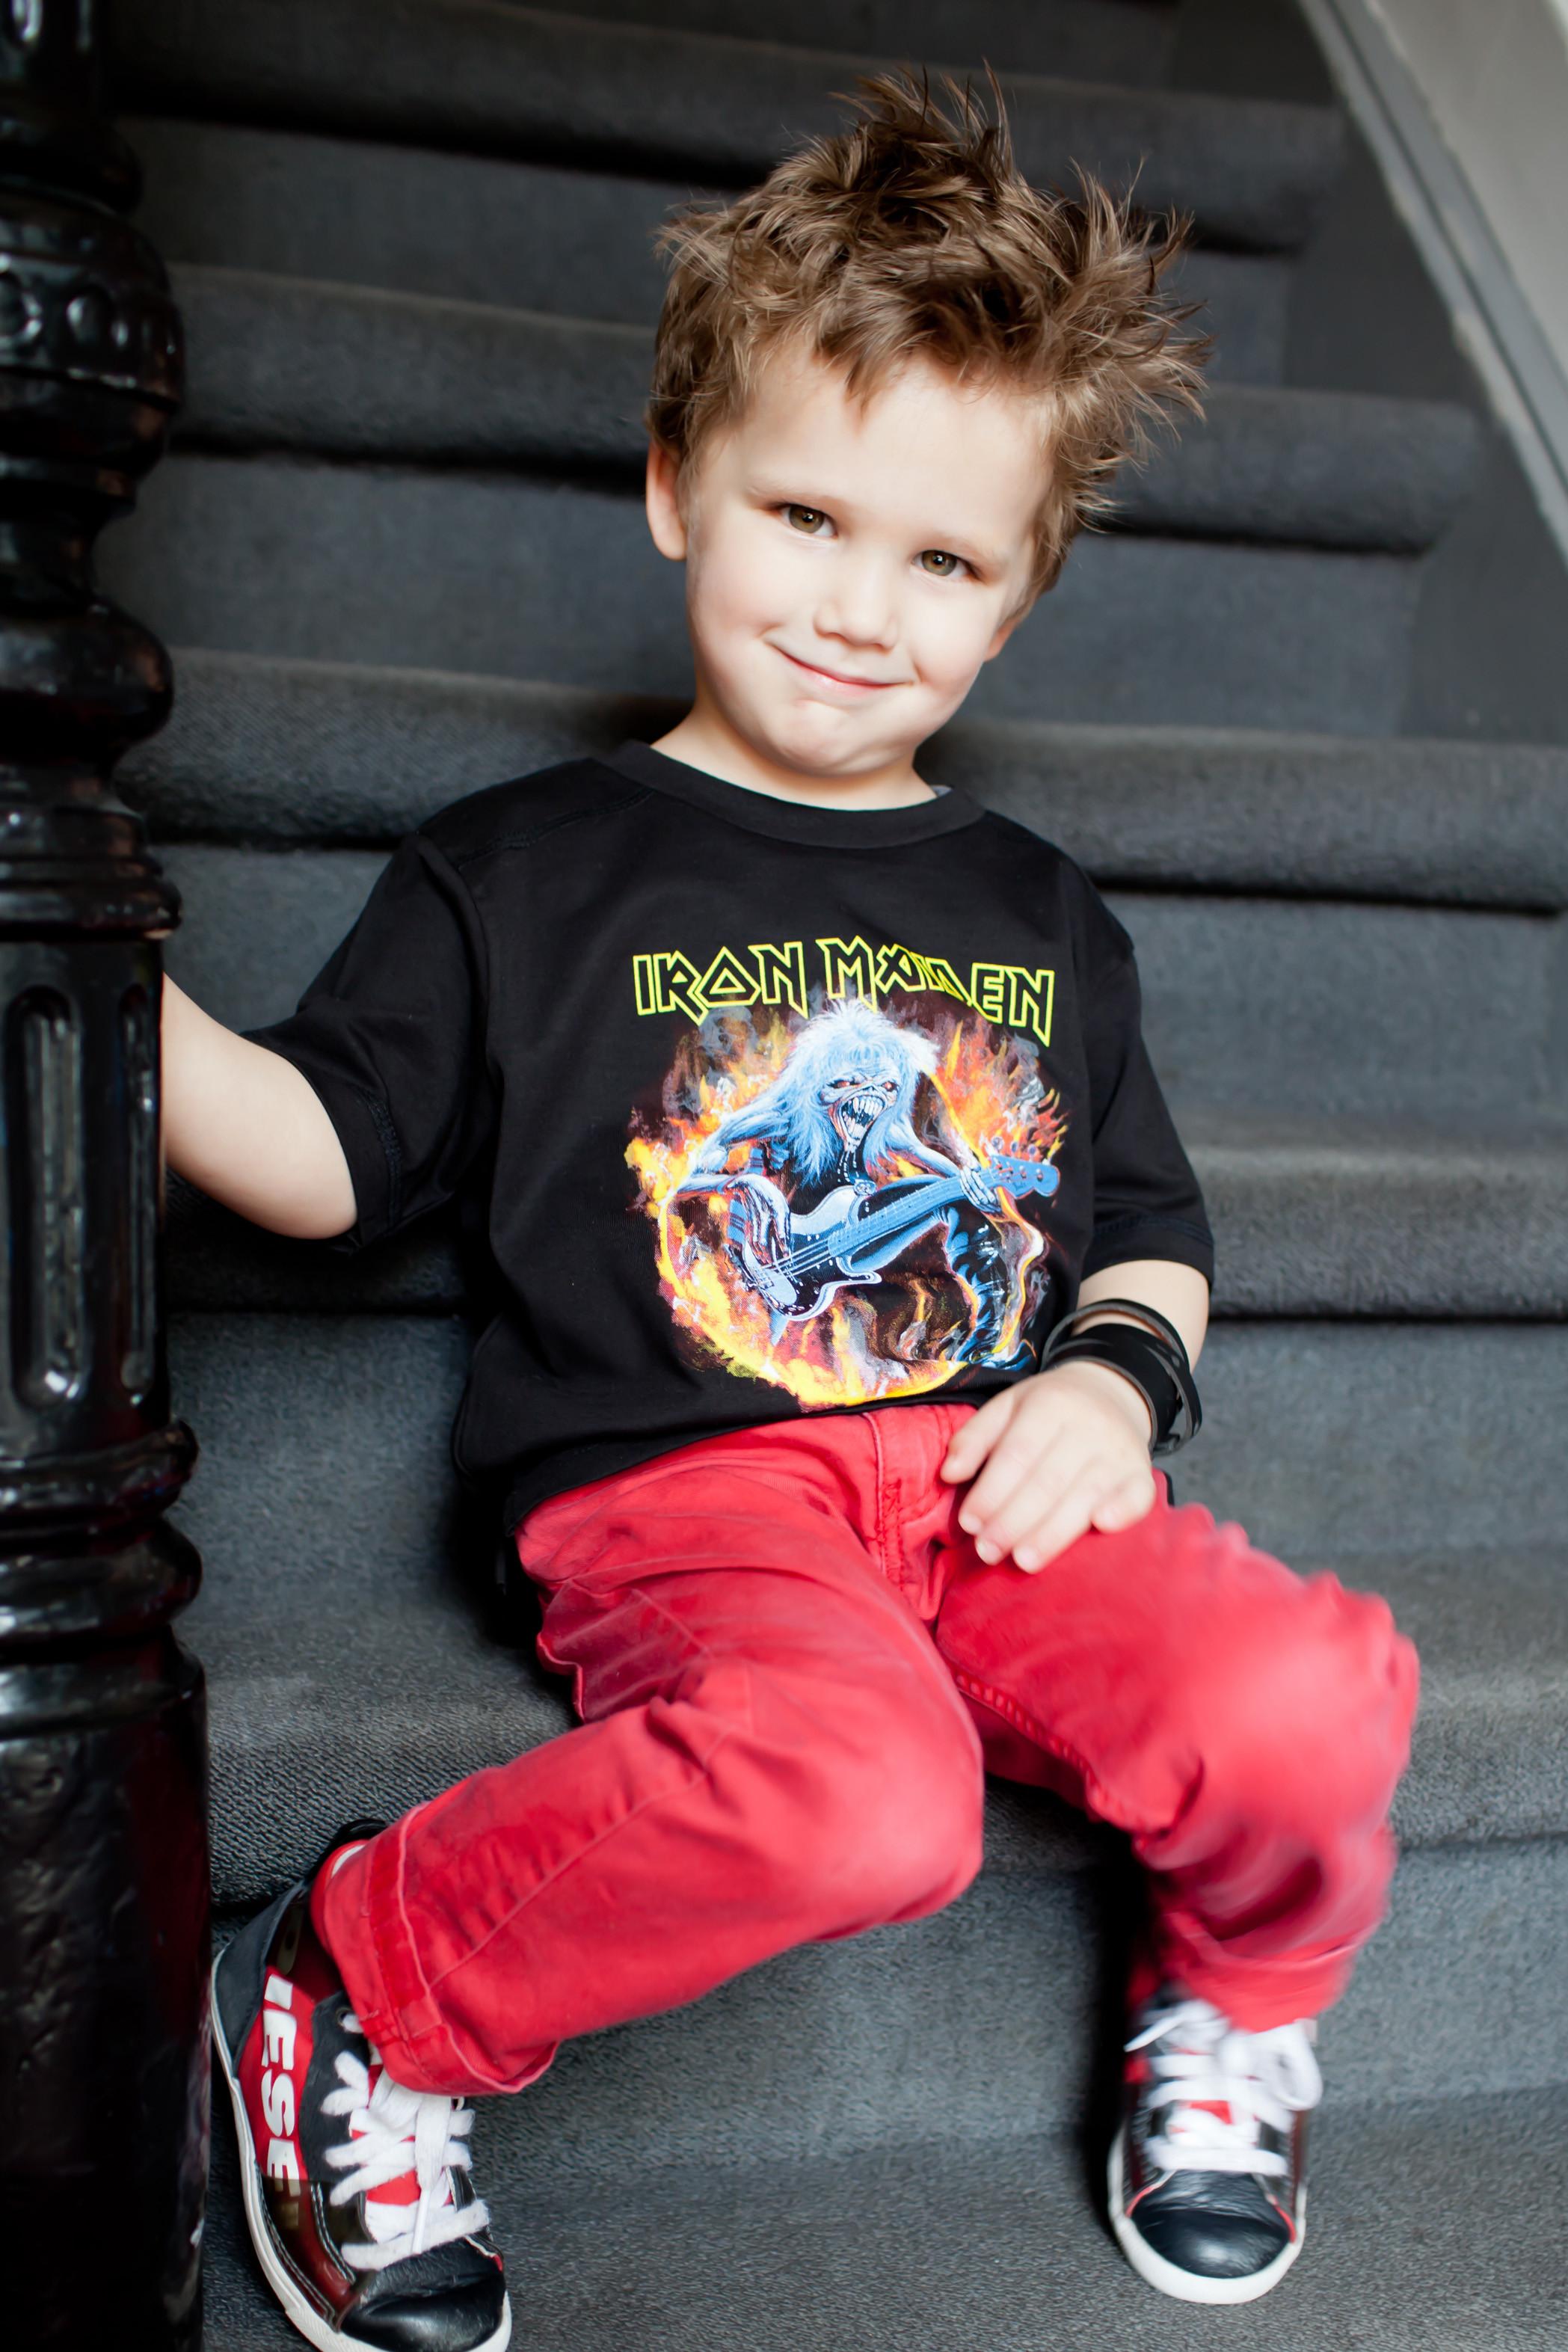 Iron Maiden Kinder T-shirt